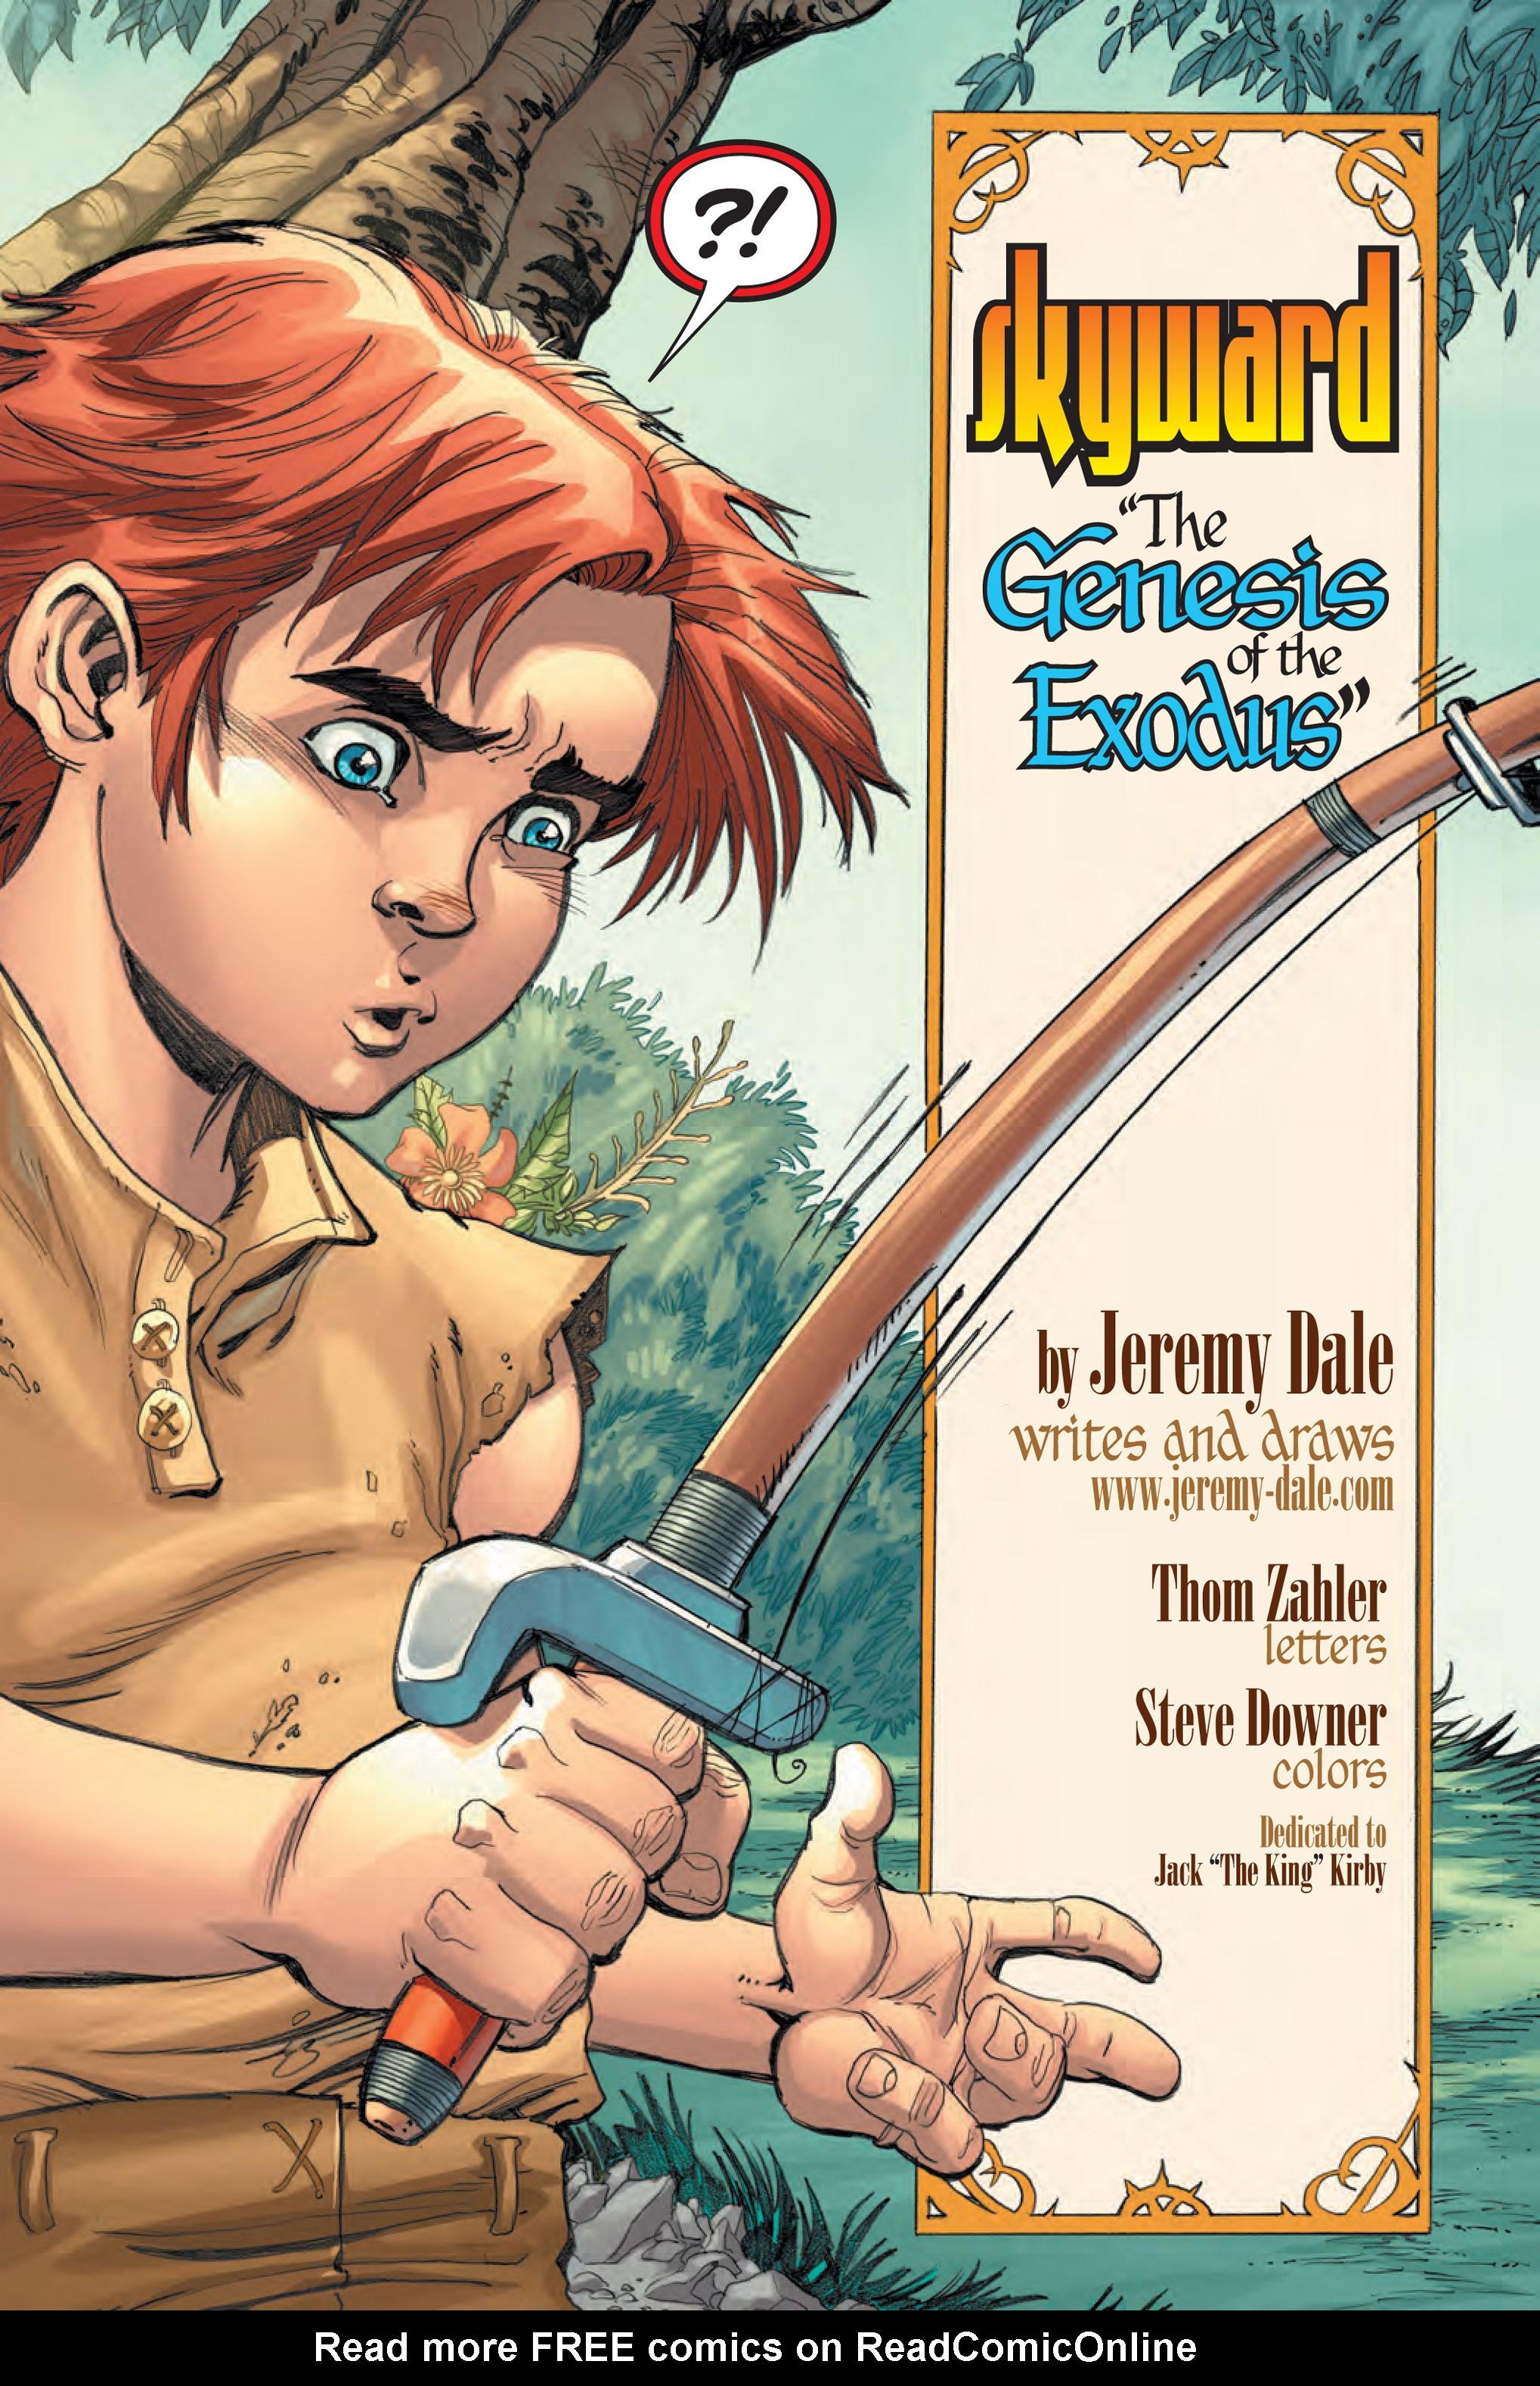 Read online Skyward comic -  Issue #1 - 3